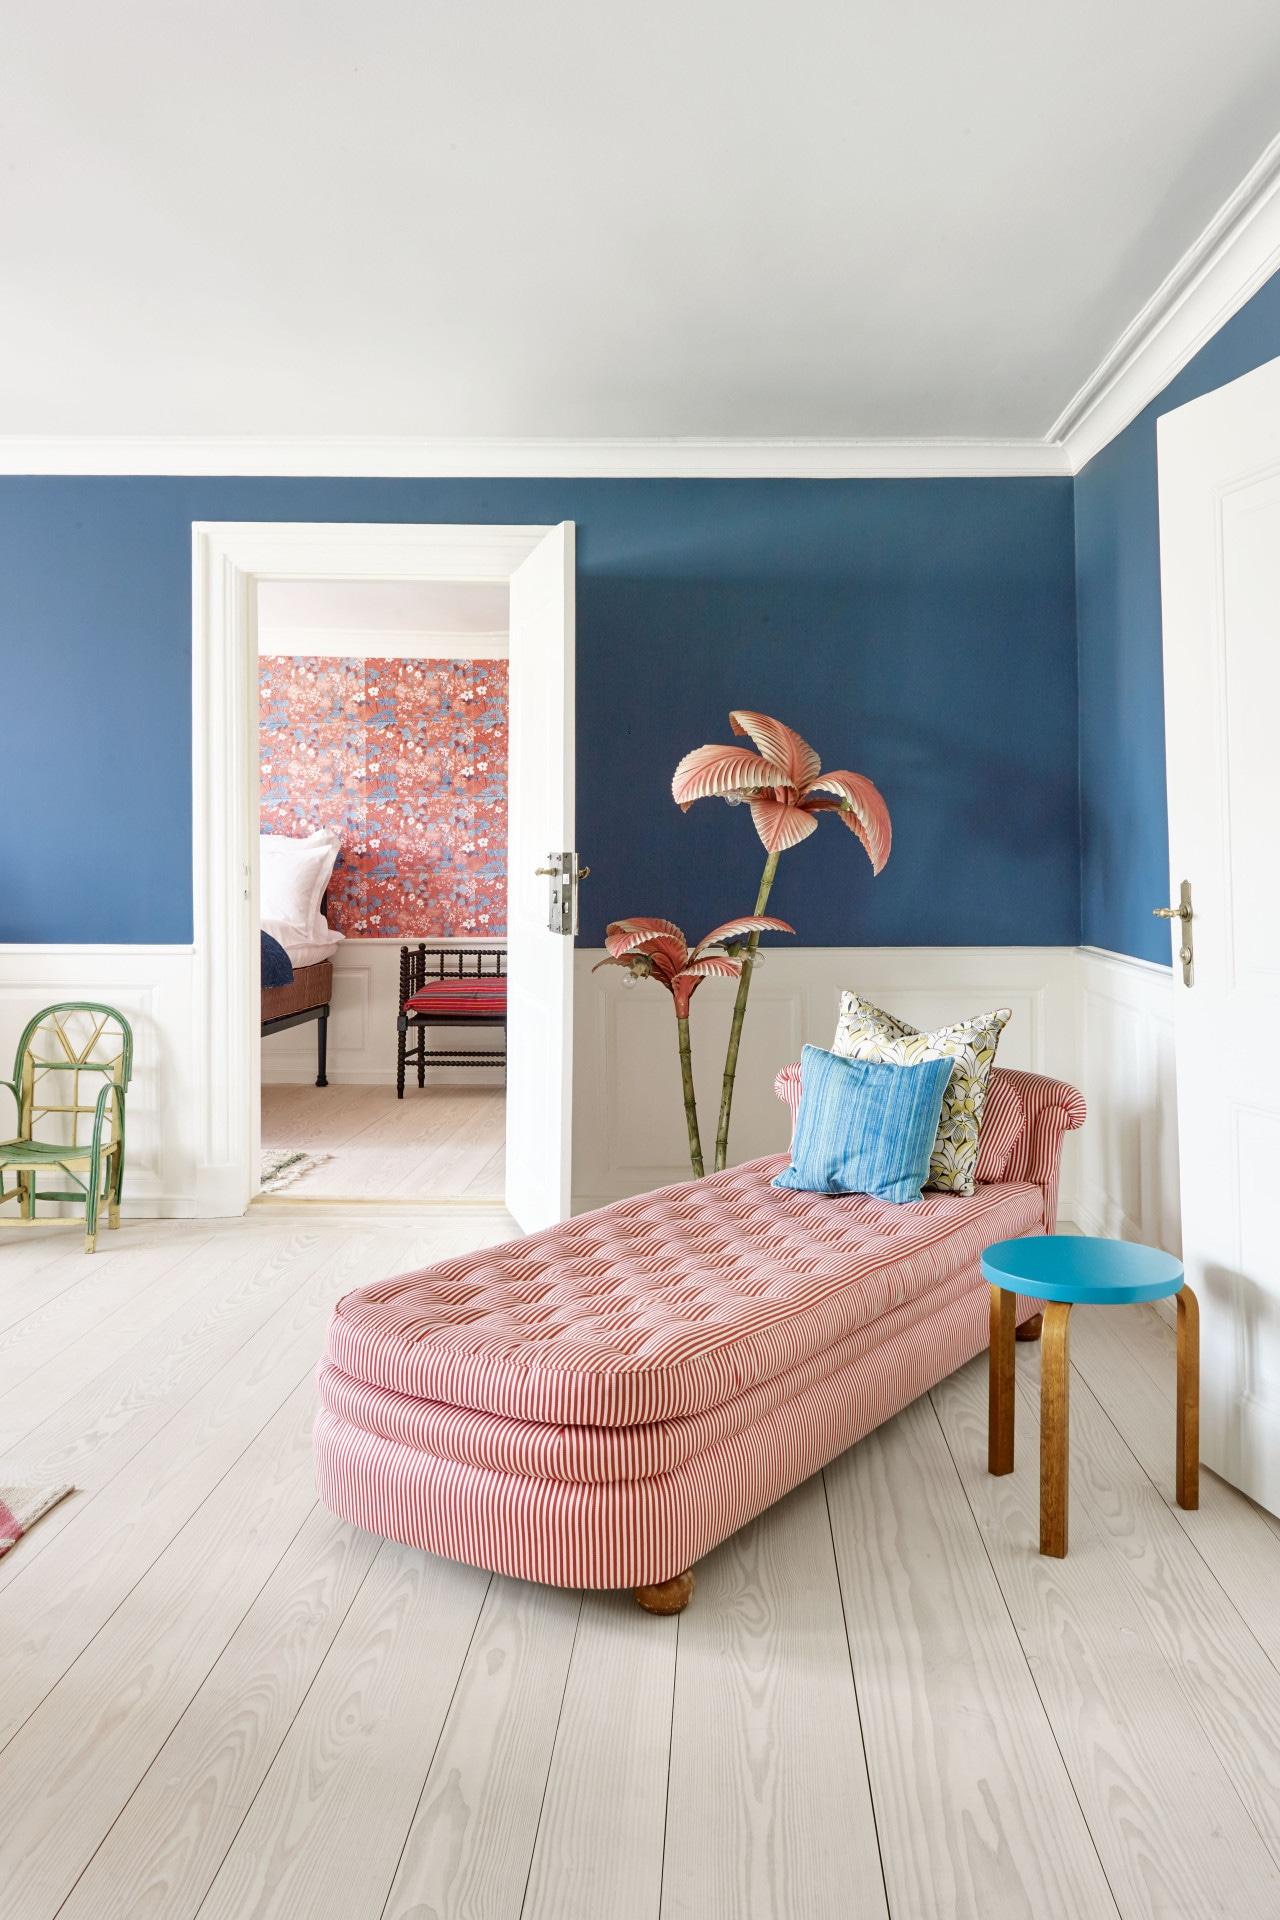 The Copenhagen apartment where you can shop the interiors